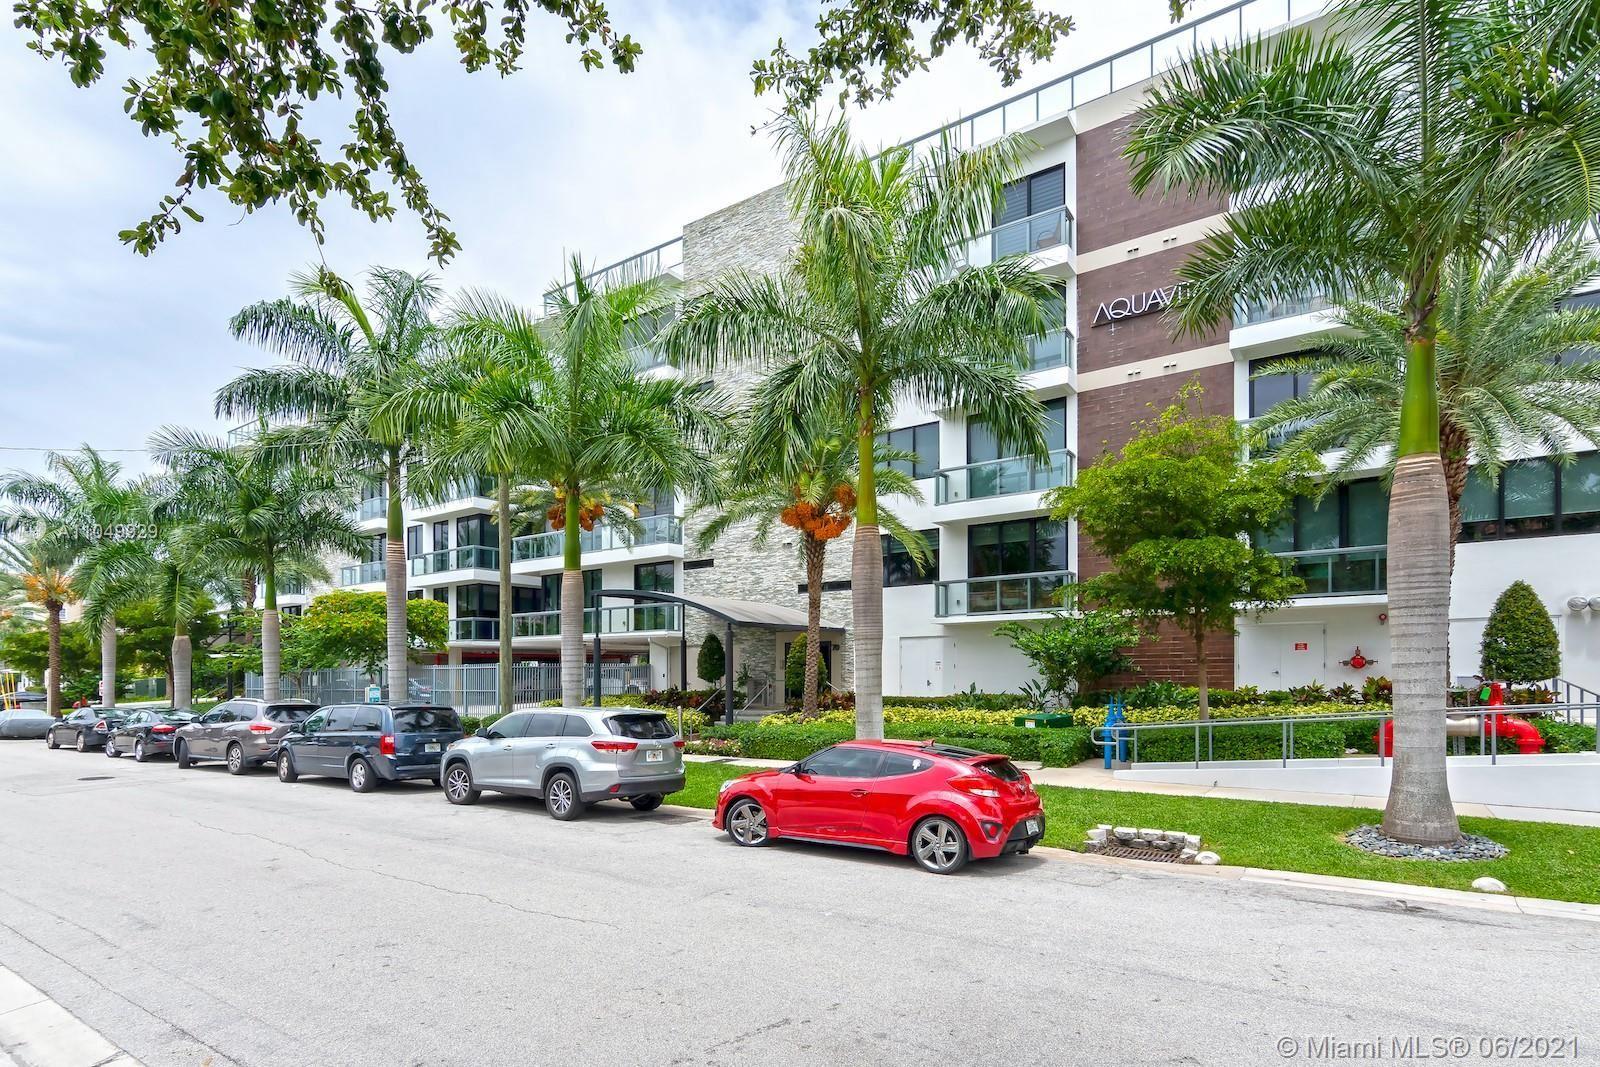 70 Hendricks Isle #202, Fort Lauderdale, FL 33301 - #: A11049929